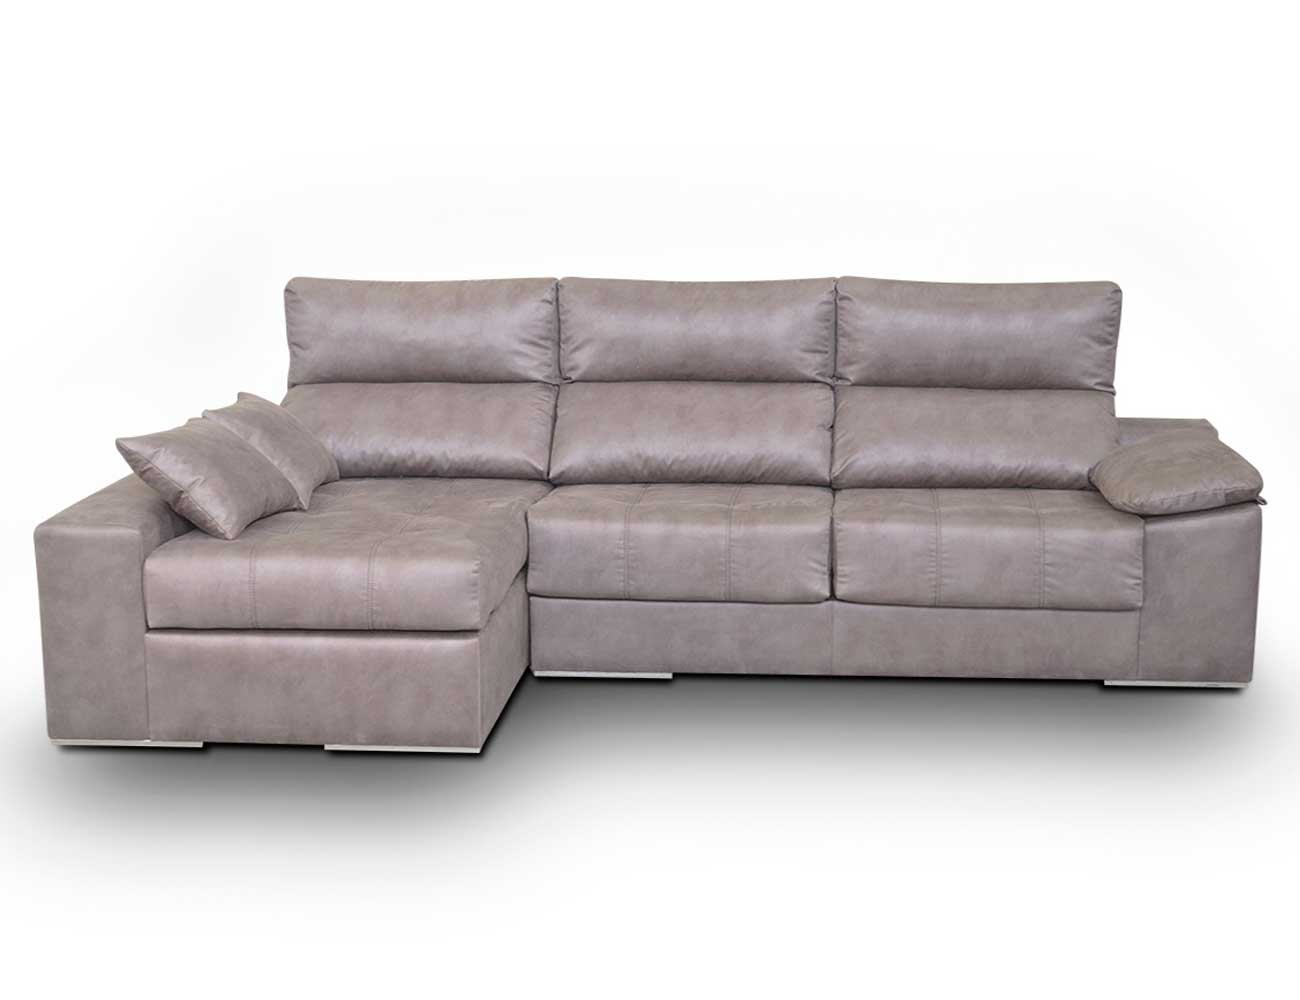 4938_sofa chaiselongue moderno asientos extraibles muy comodo dobles pespuntes donatella